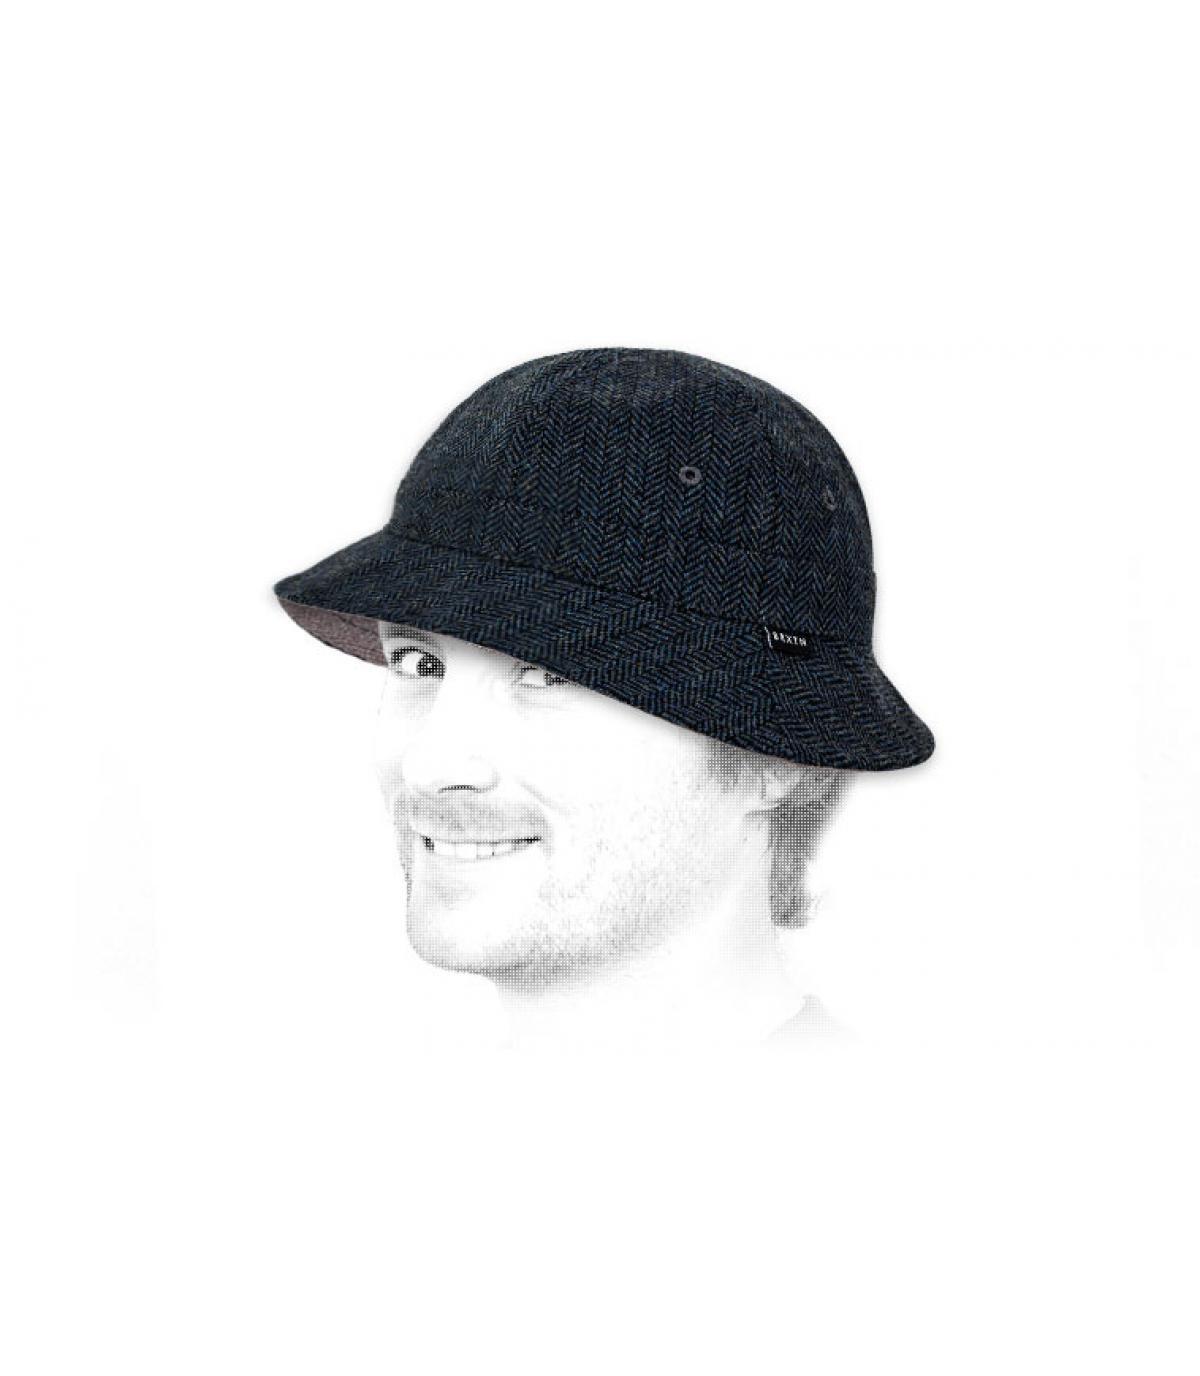 Détails Banks bucket hat navy grey - image 3